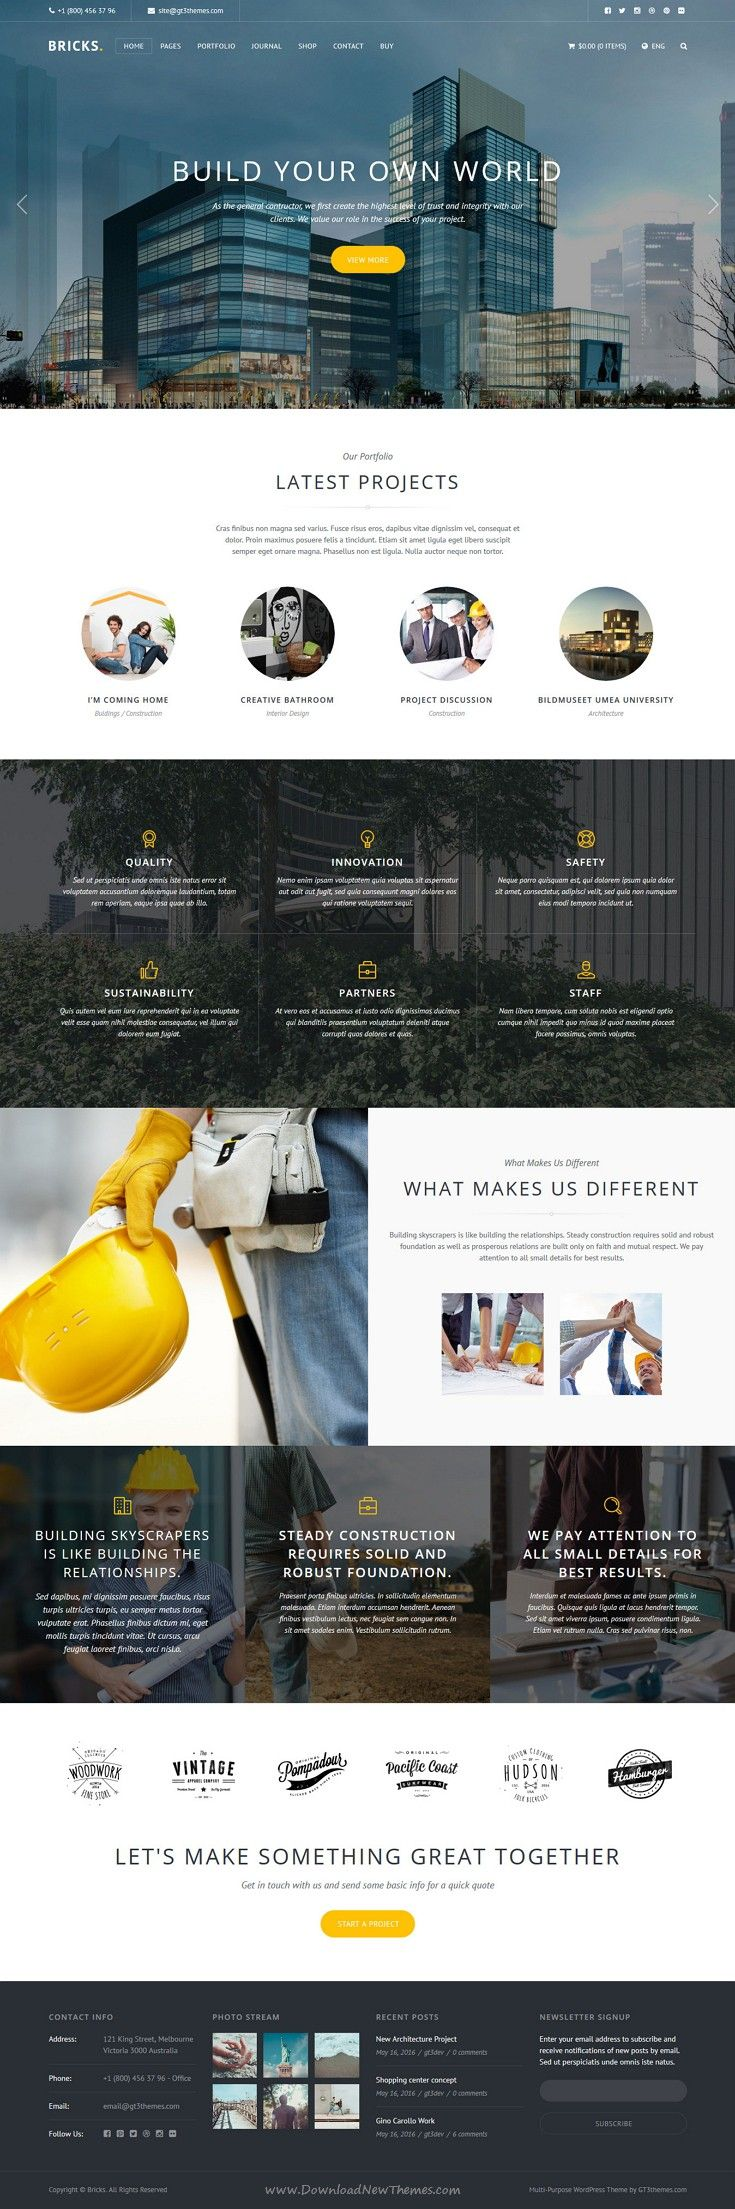 bricks is beautiful responsive premium wordpress theme for construction building business website